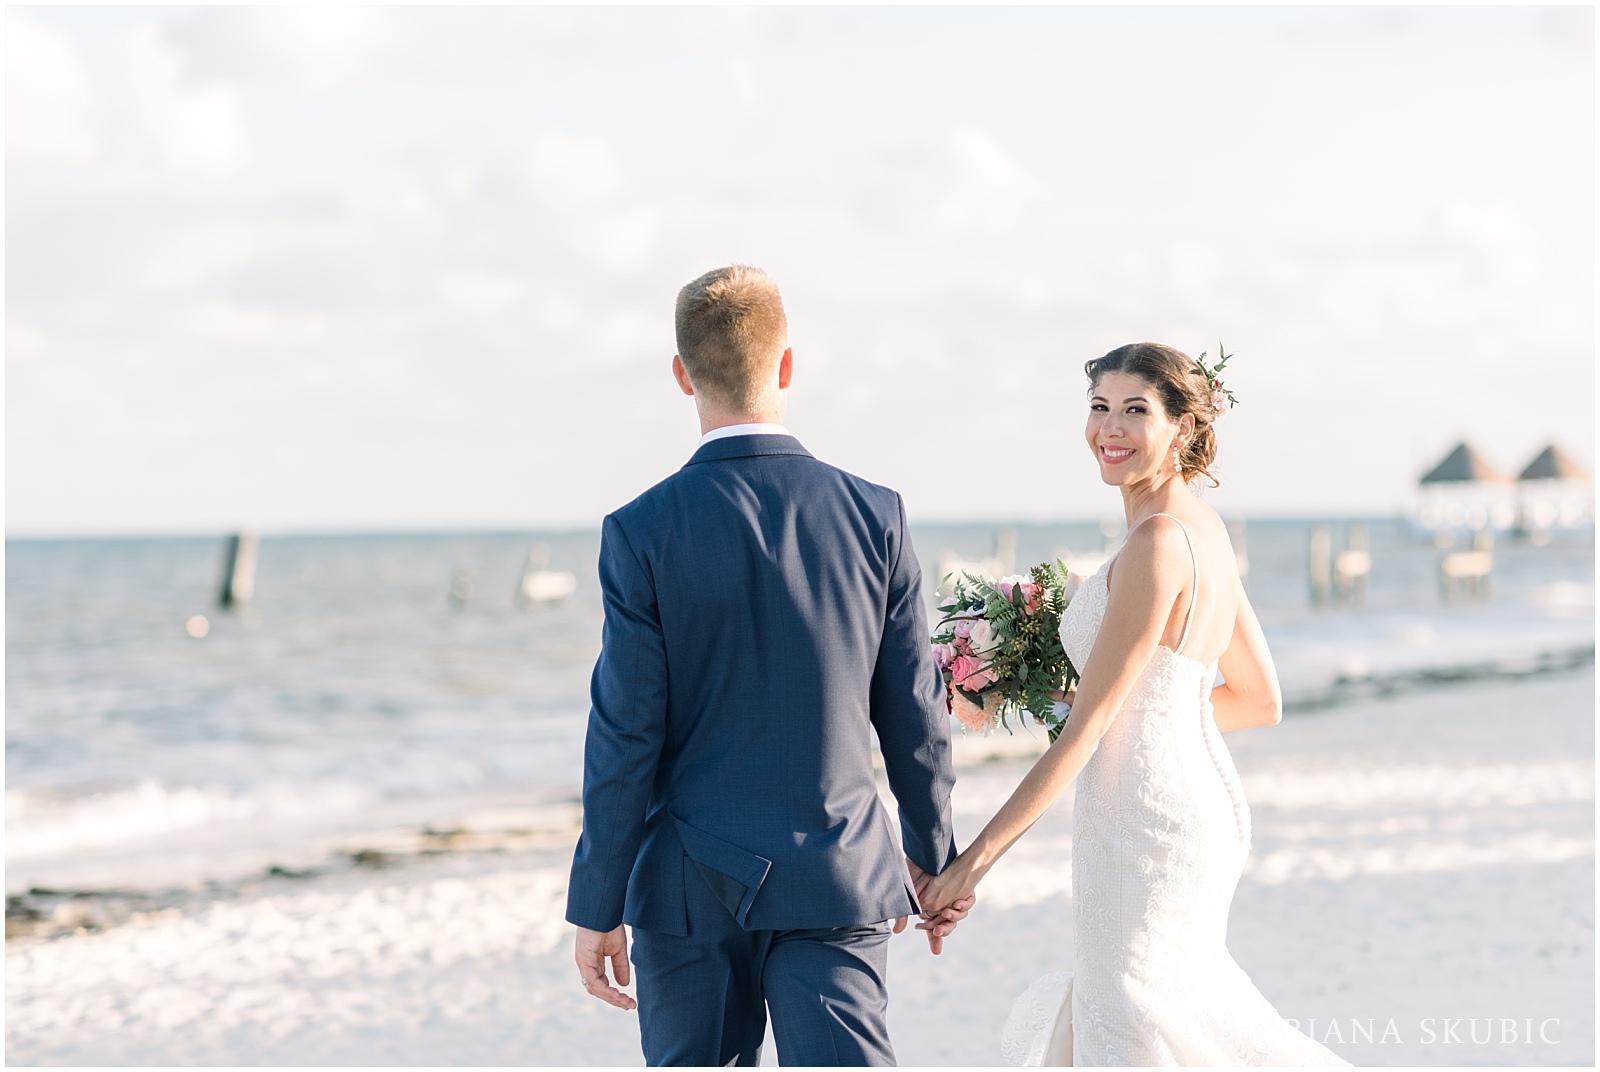 TJ_Now_Sapphire_Riviera_Cancun_Mexico_Wedding_Photos_0250.jpg